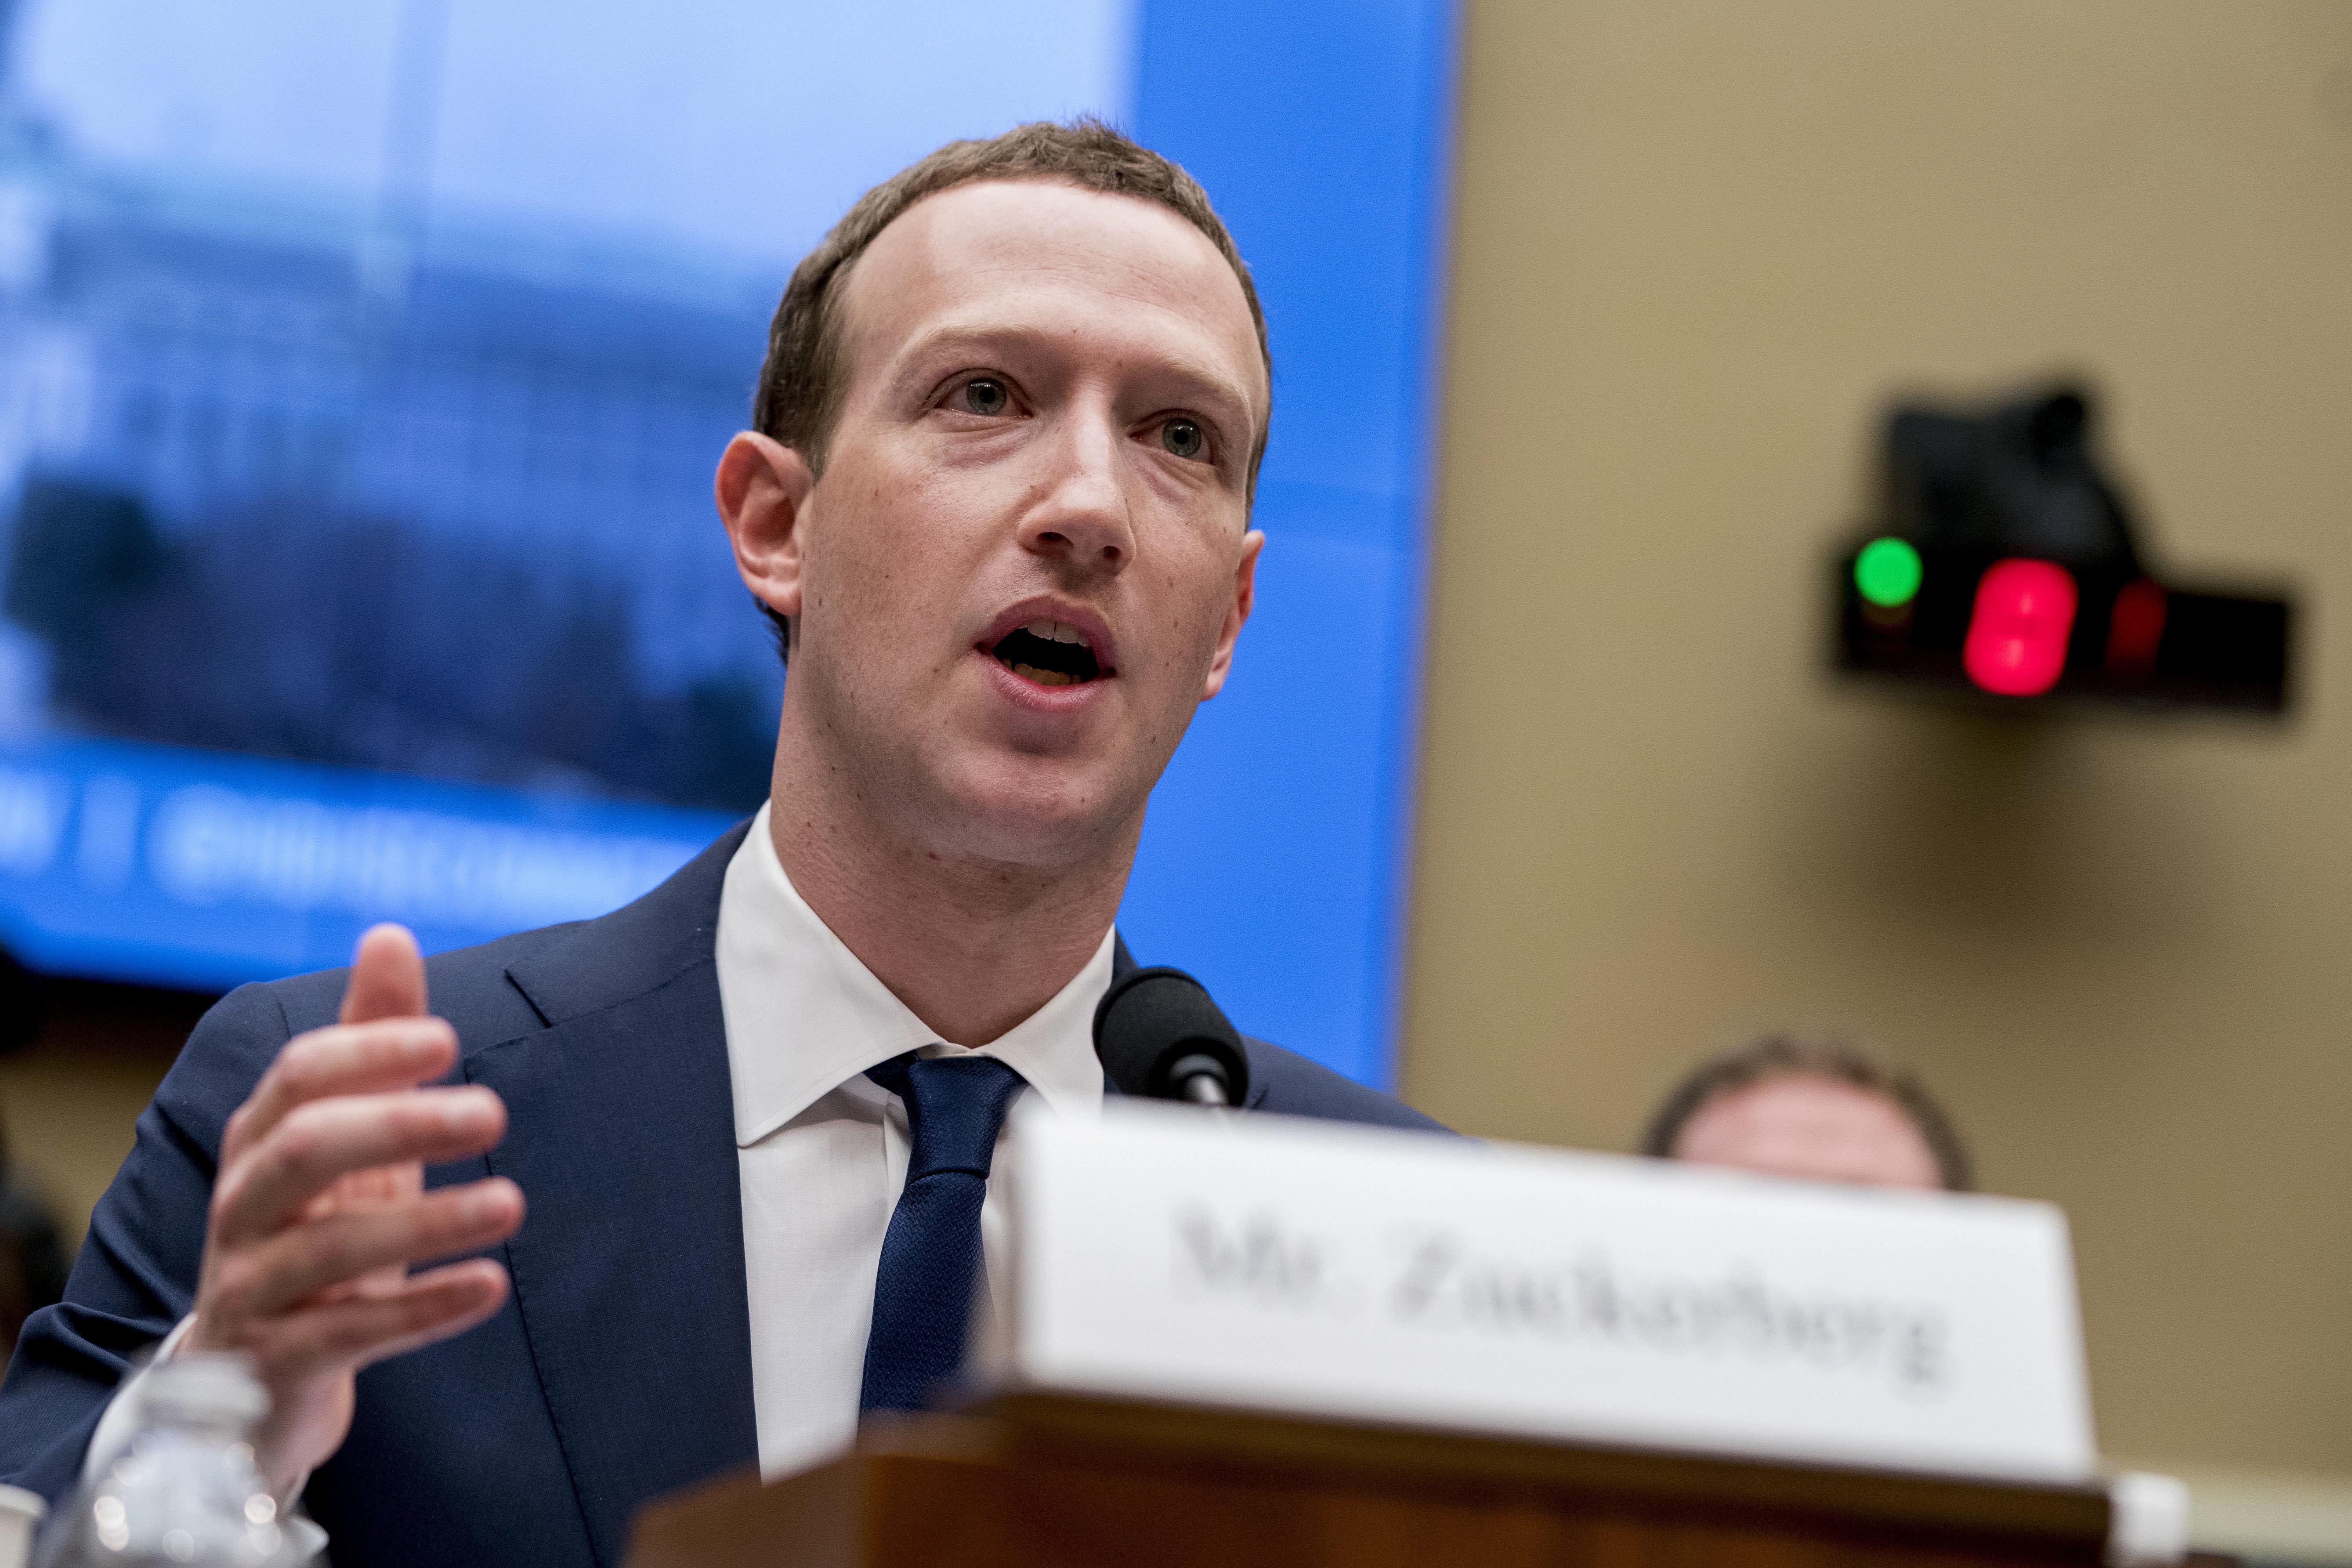 Facebook CEO Zuckerberg dines with senators in DC